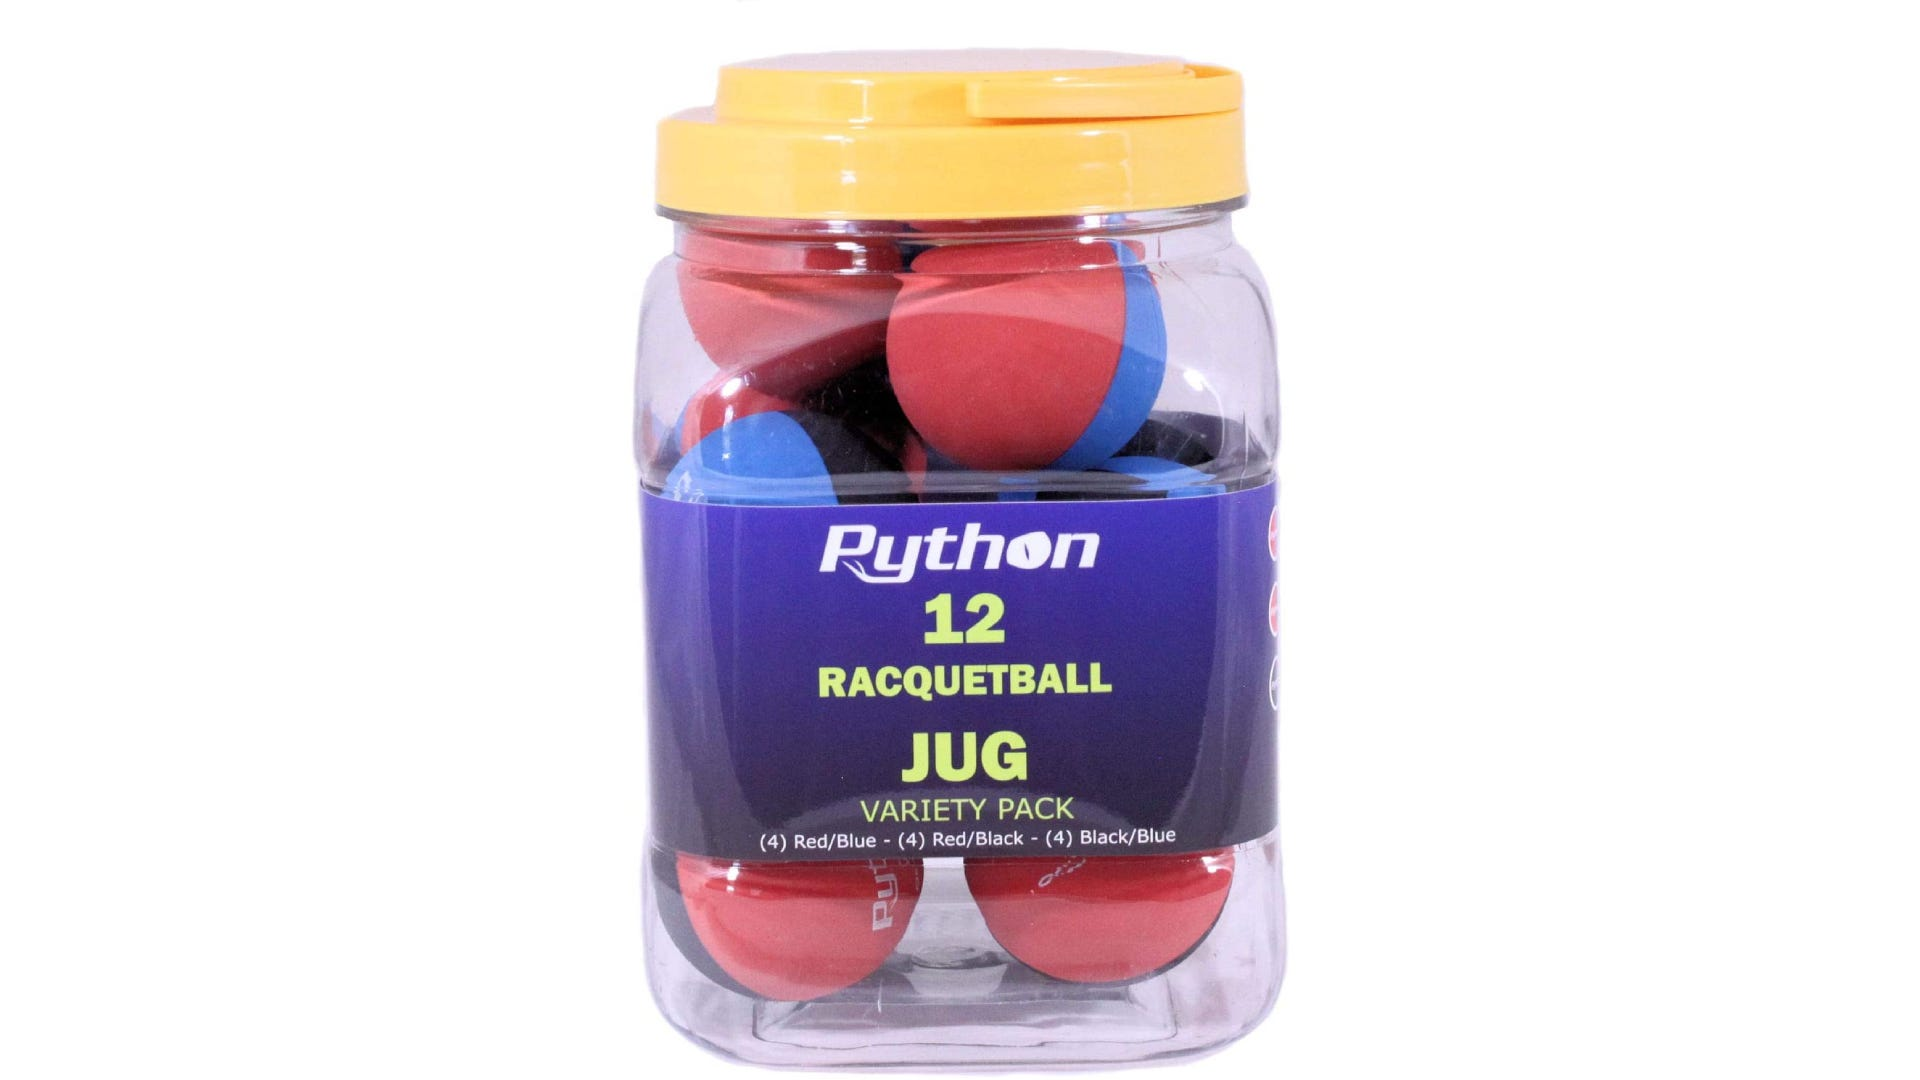 A tub of 12 multi-colored racquetballs.